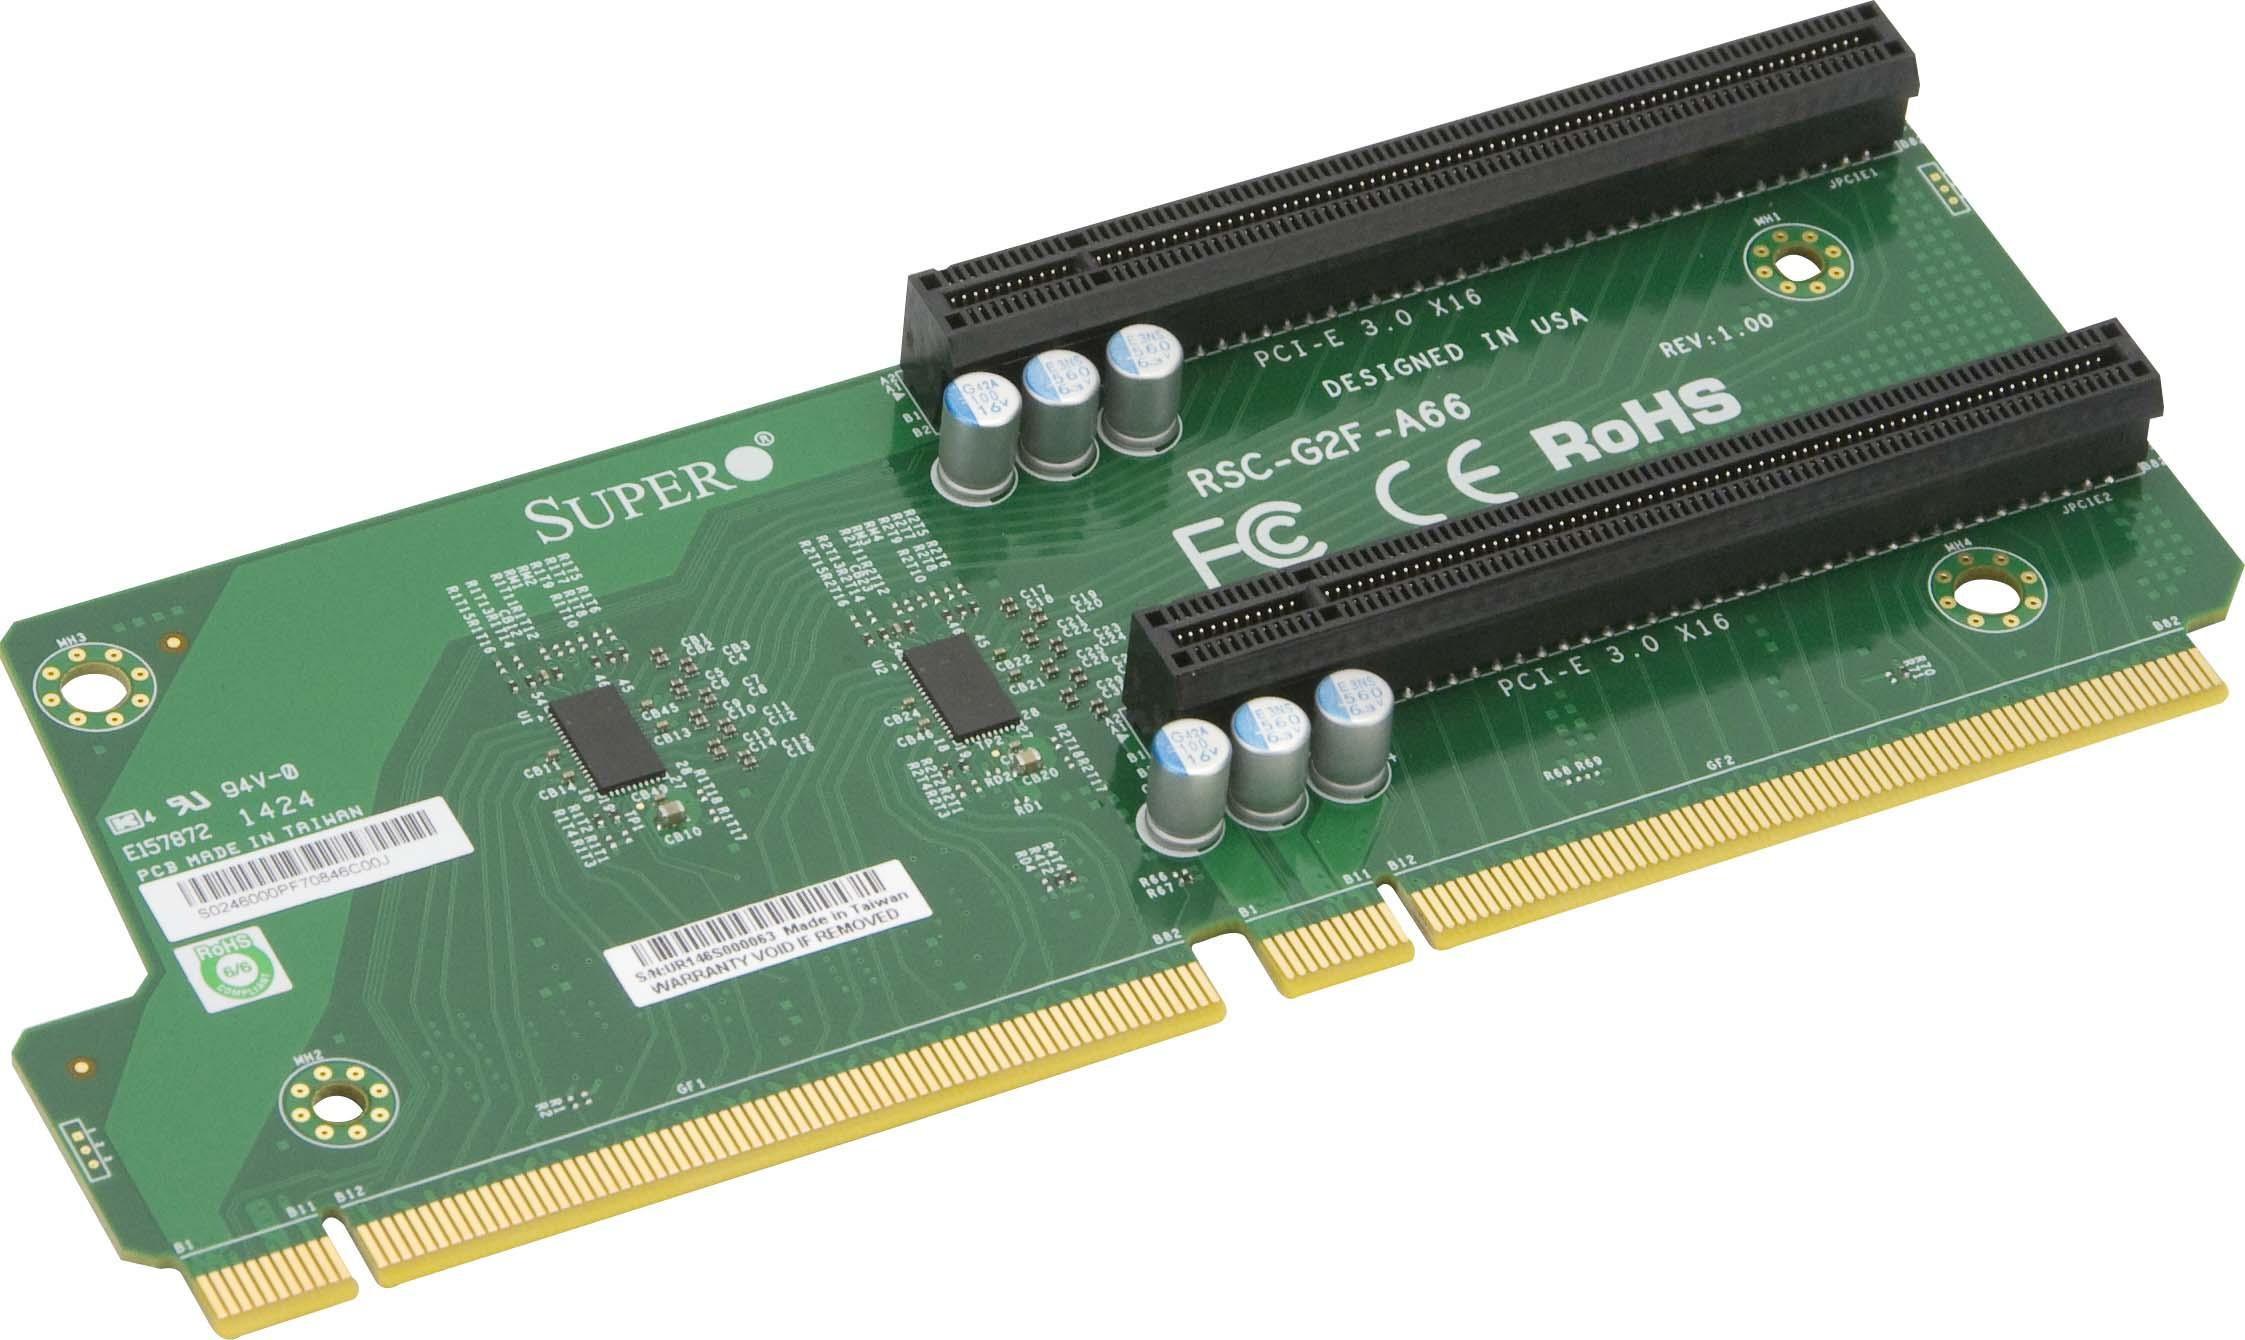 rsc-g2f-a66.jpg